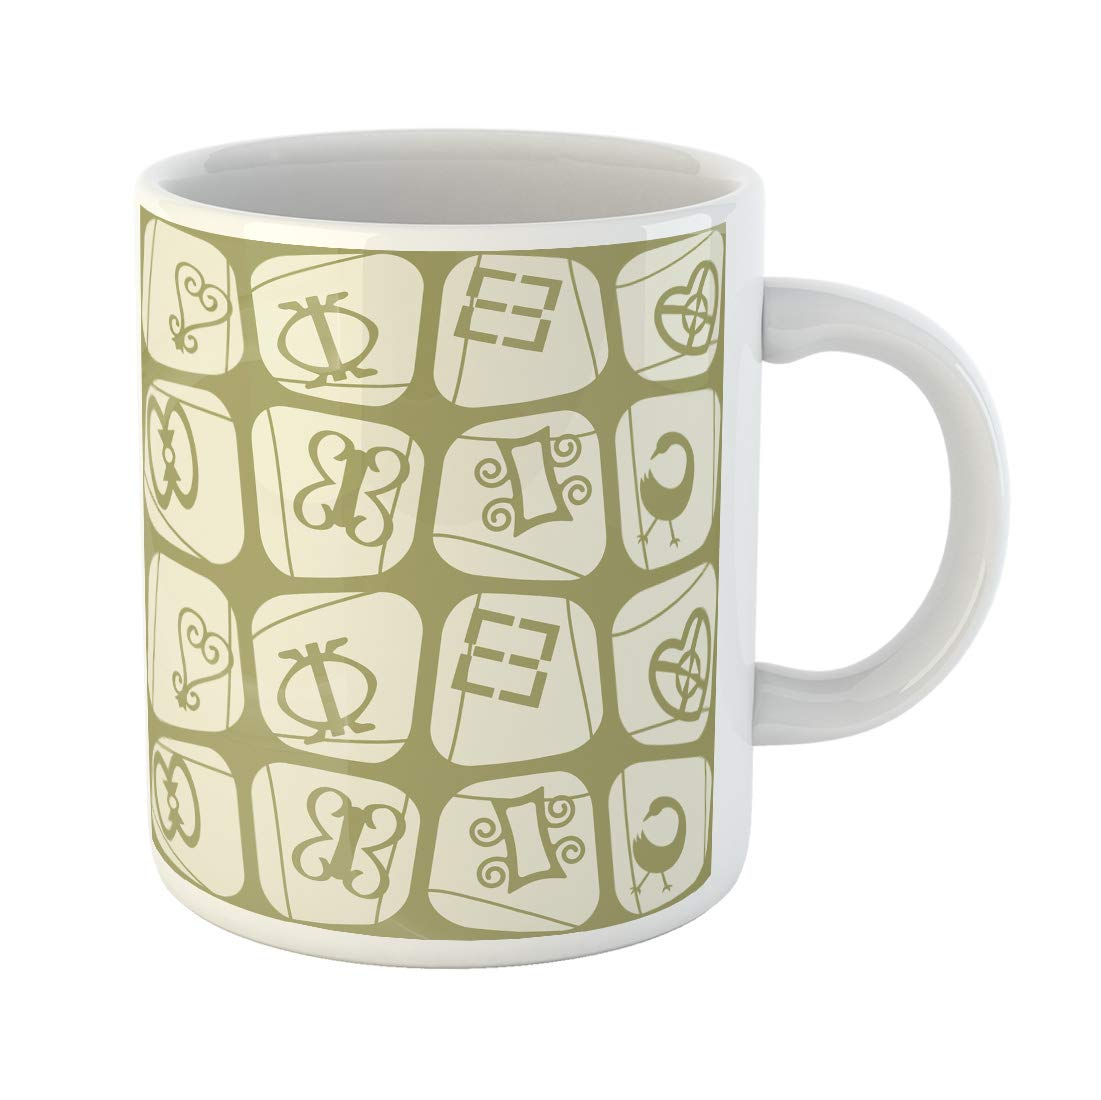 Funny coffee mug clipart jpg royalty free download Amazon.com   Semtomn Funny Coffee Mug Africa Adinkra Symbols African ... jpg royalty free download